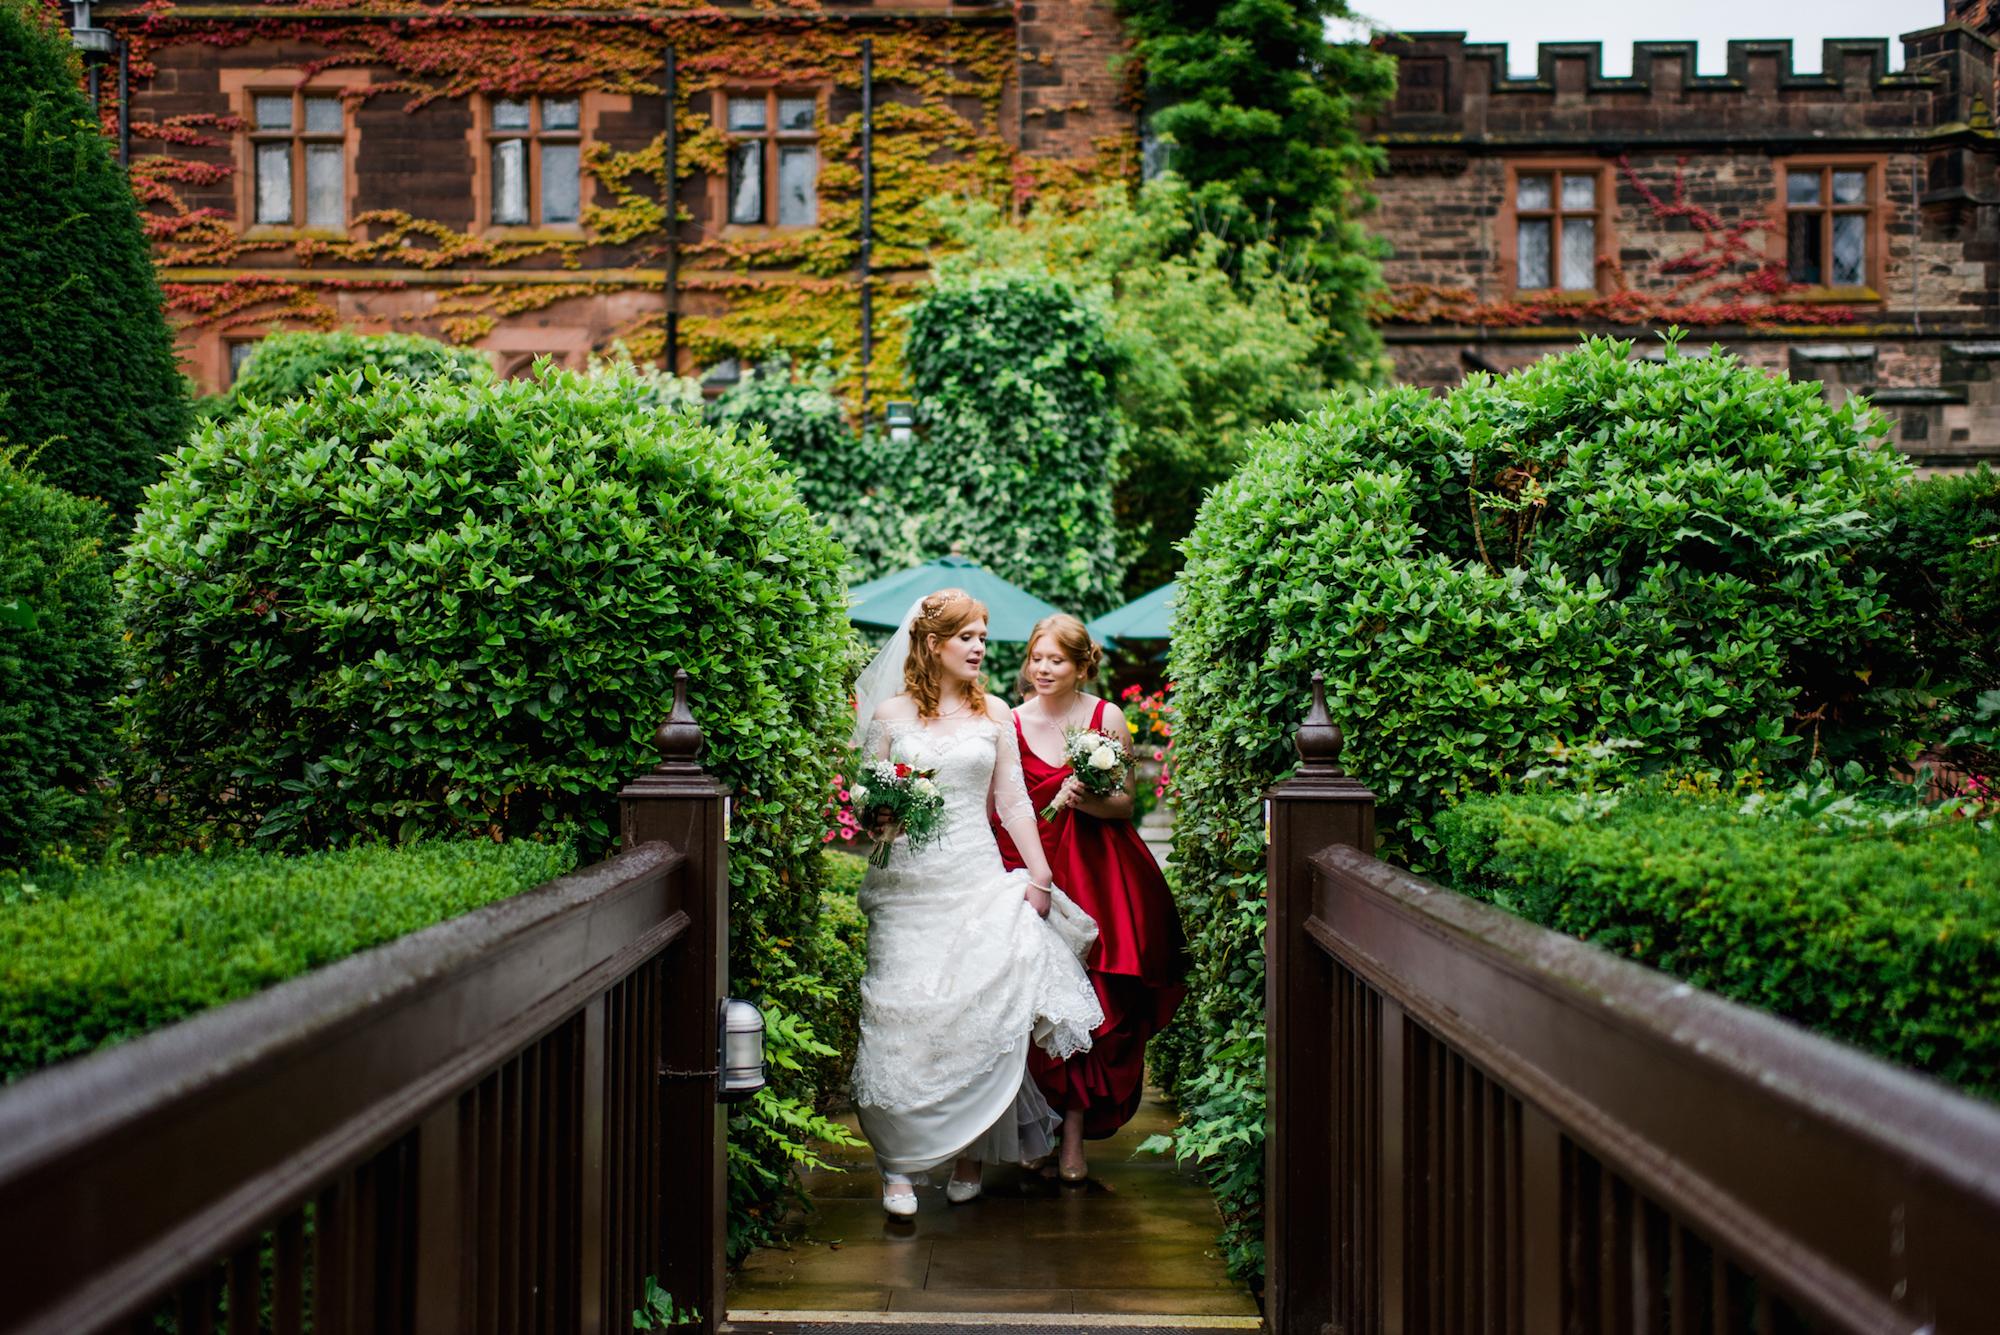 116 Bride Groom London Wedding Photographer Photography.jpg